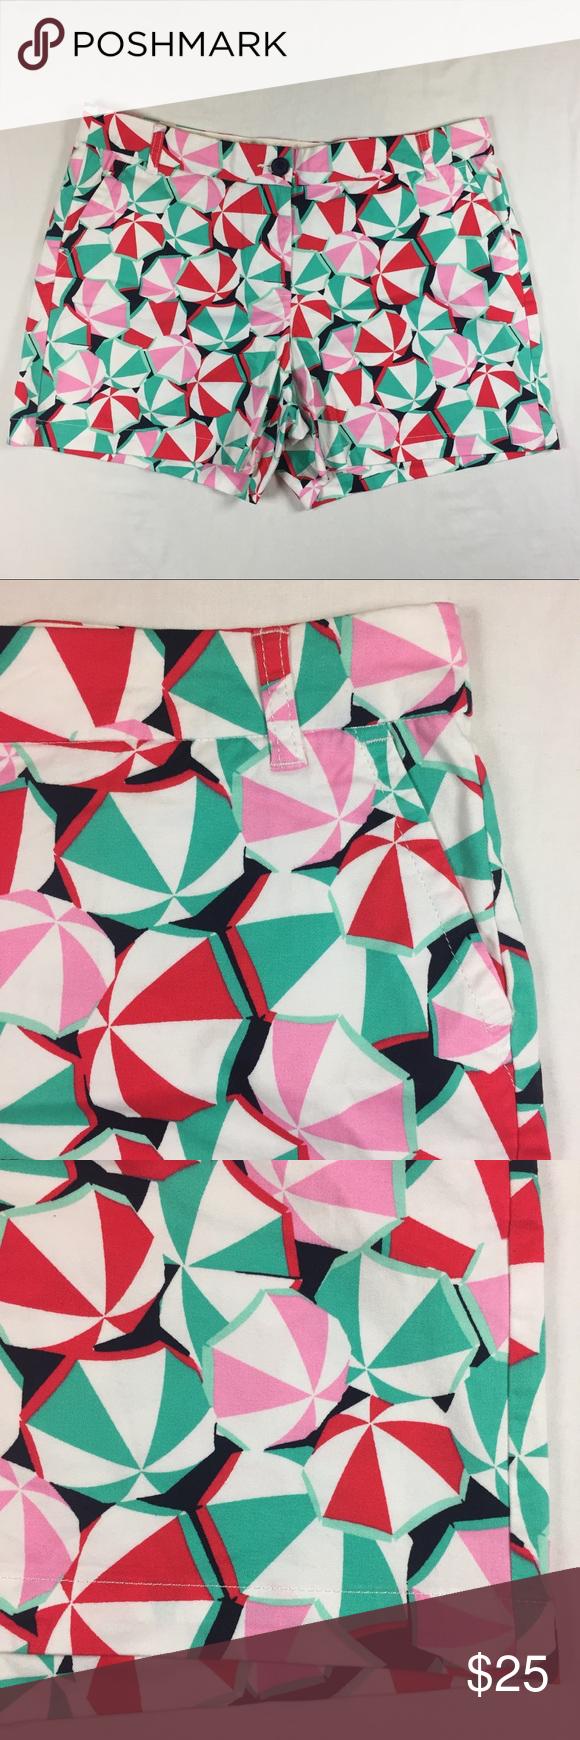 Crown & Ivy pink red beach umbrella shorts 12 Red beach